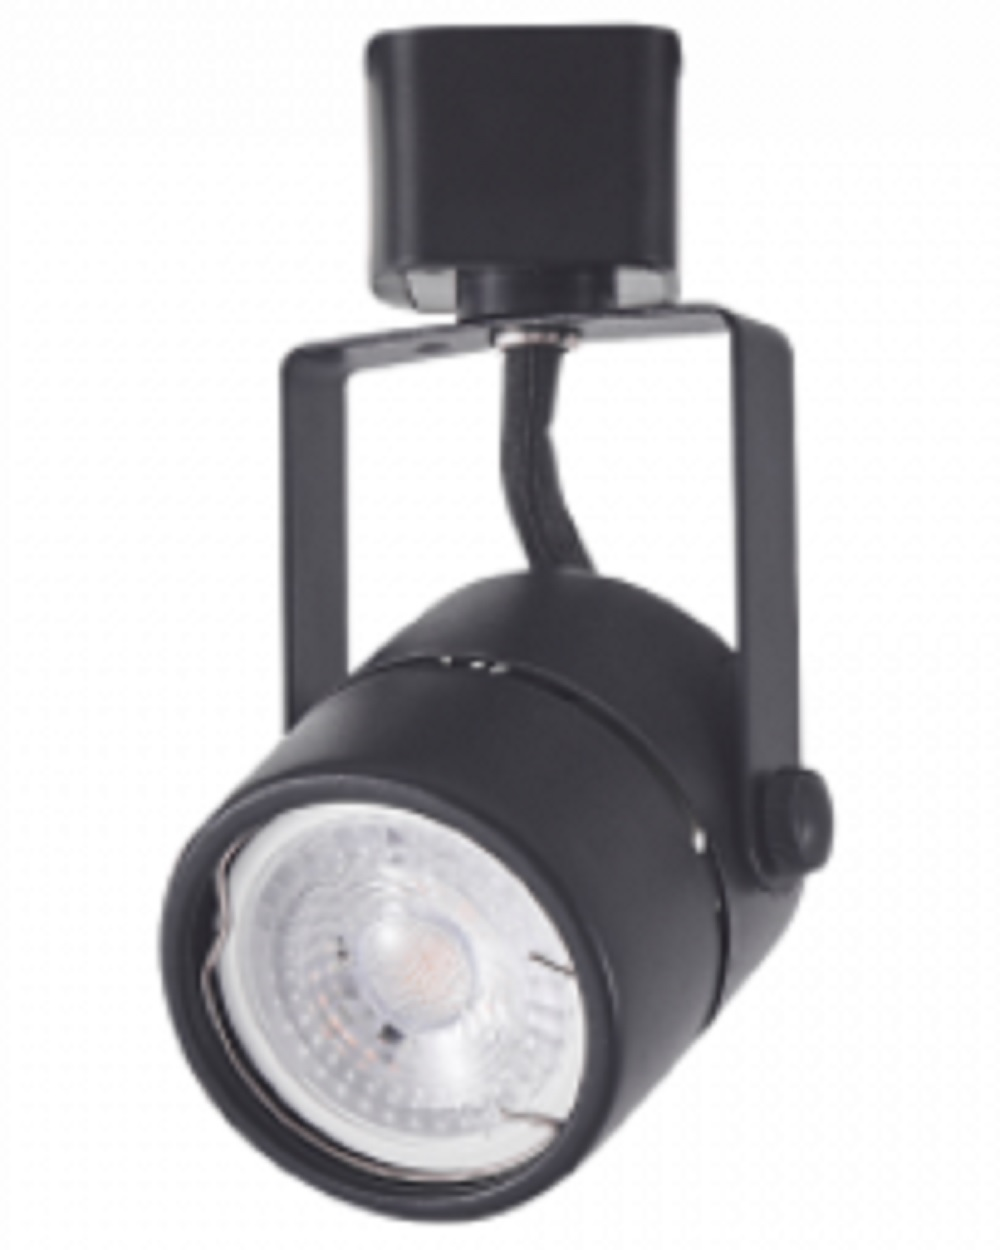 SPOT PARA TRILHO MR16/GU10 PRETO GADITA SEM LAMP